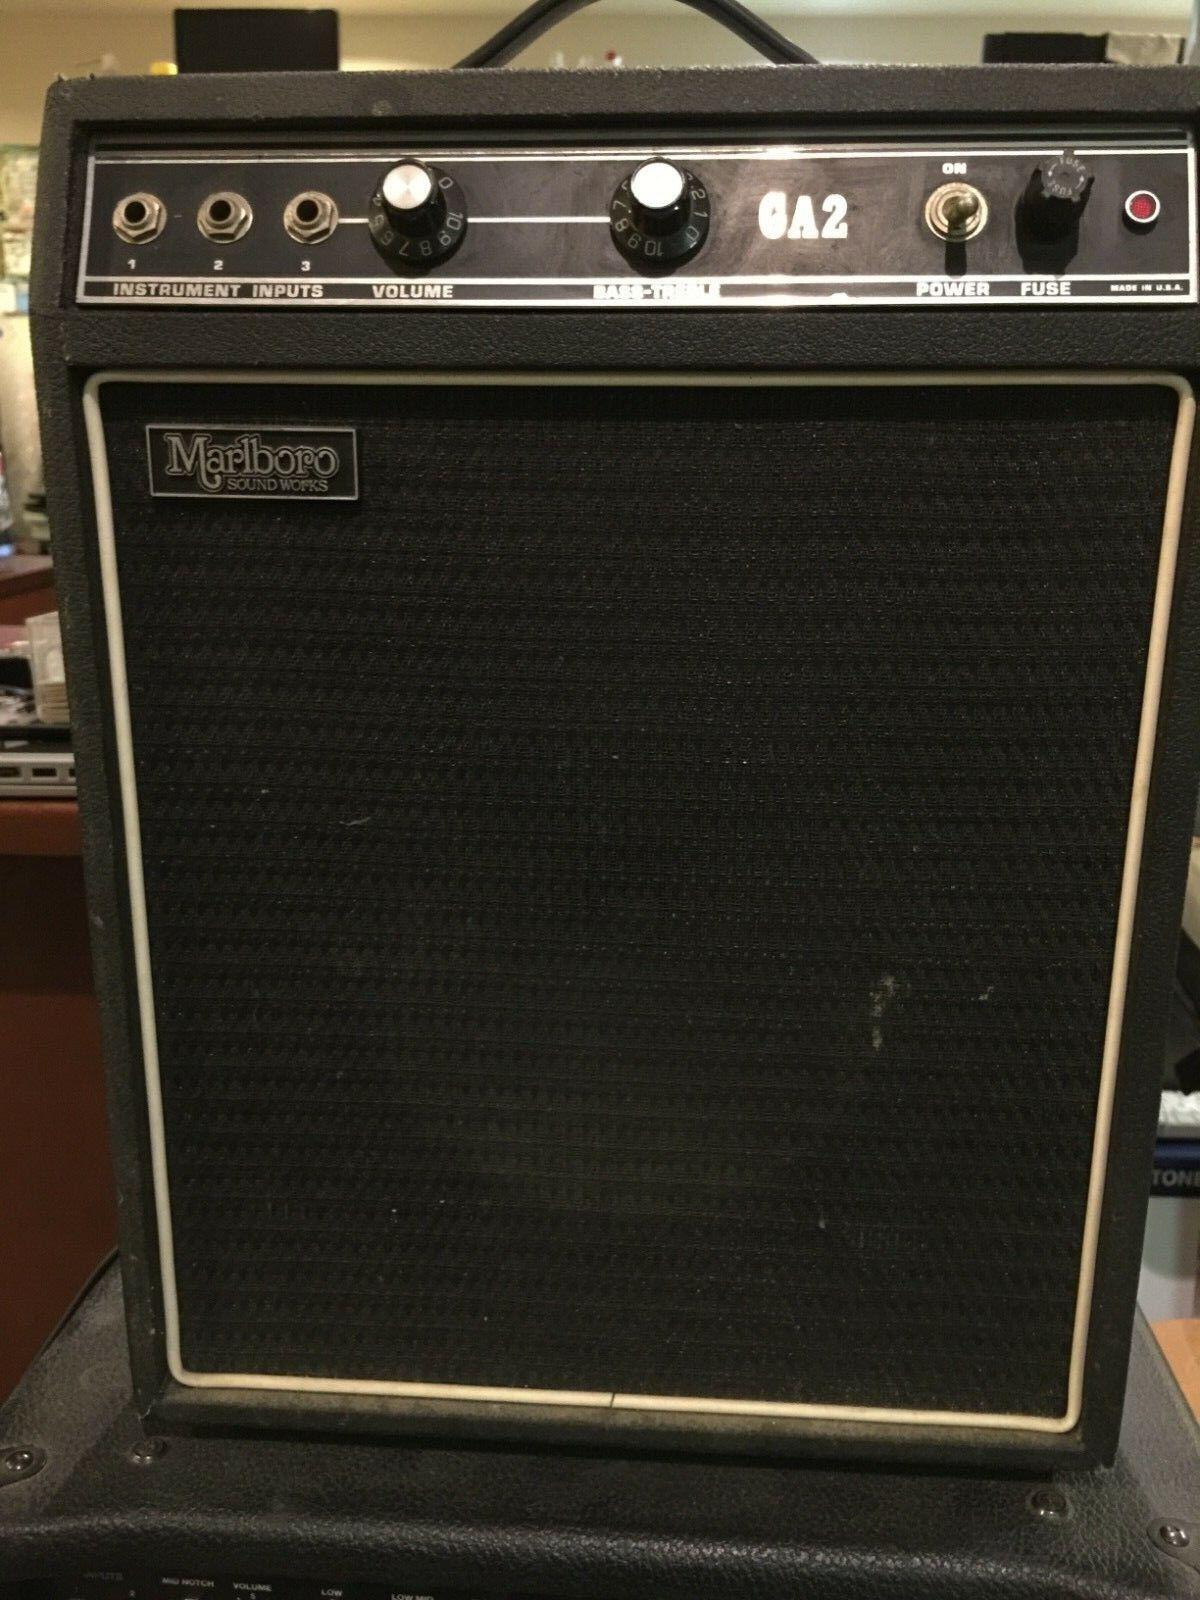 MarlbGold Sound Works GA2 Guitar Amp